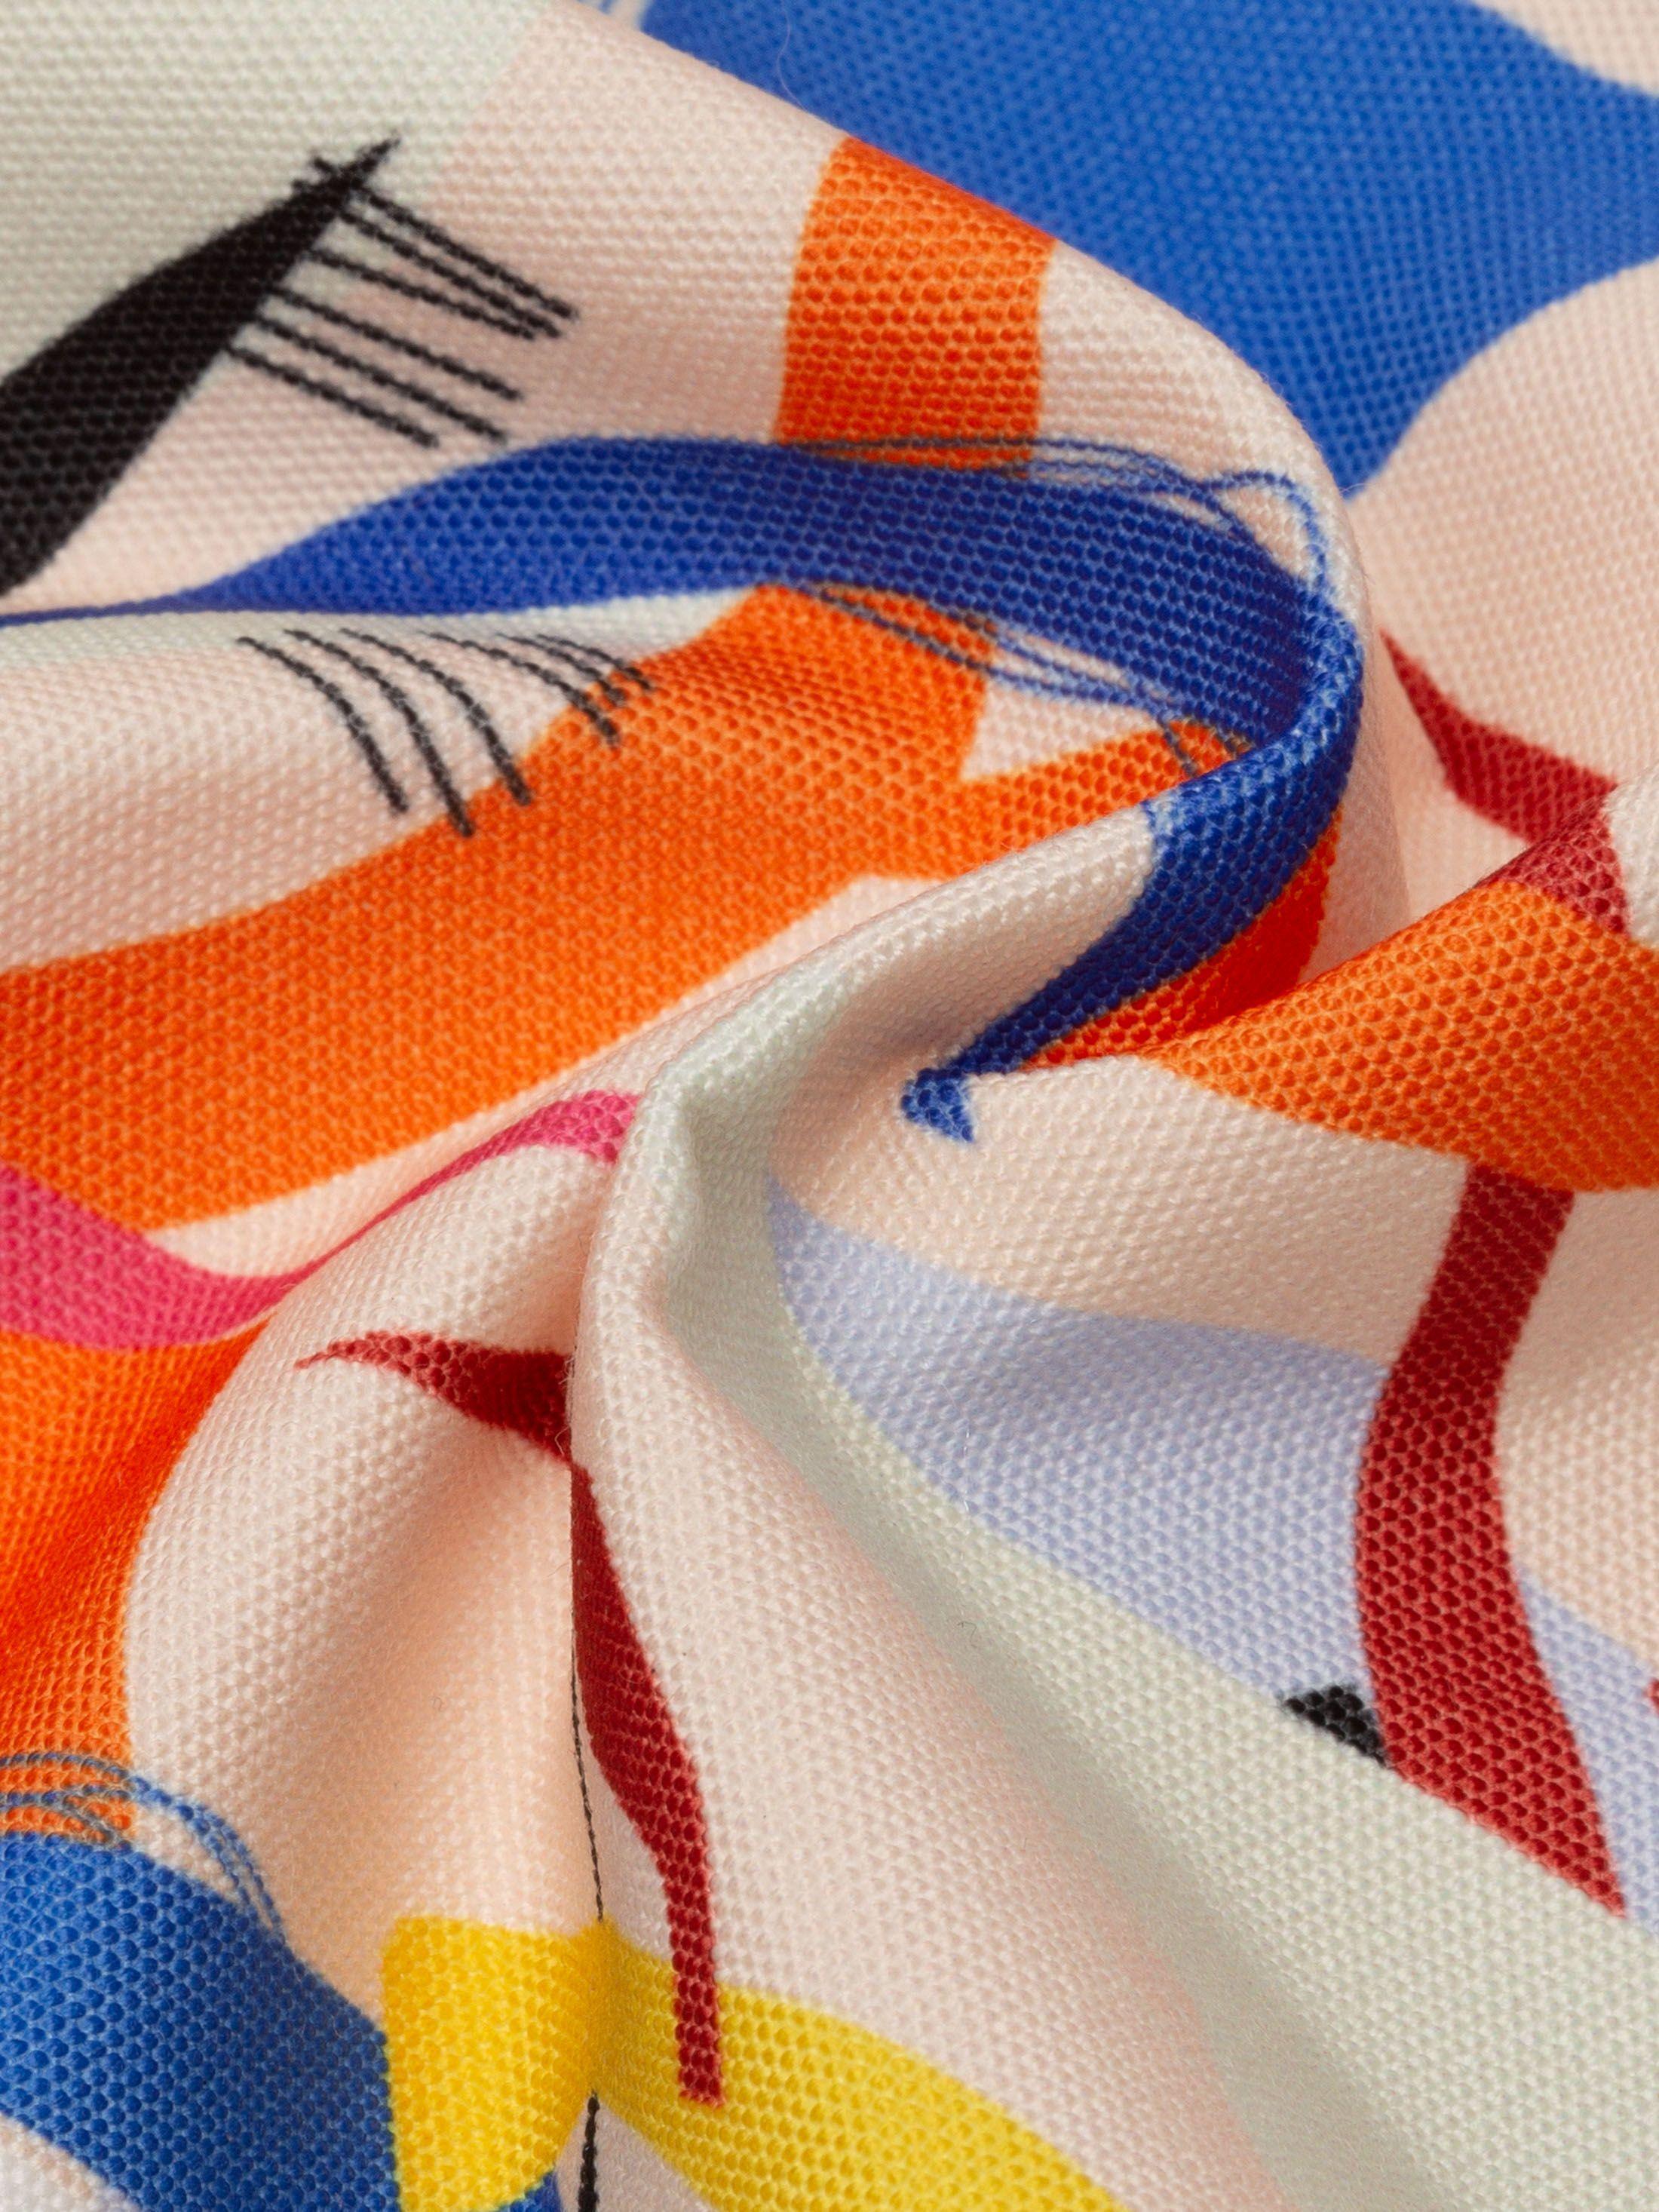 digital design printed canvas fabric